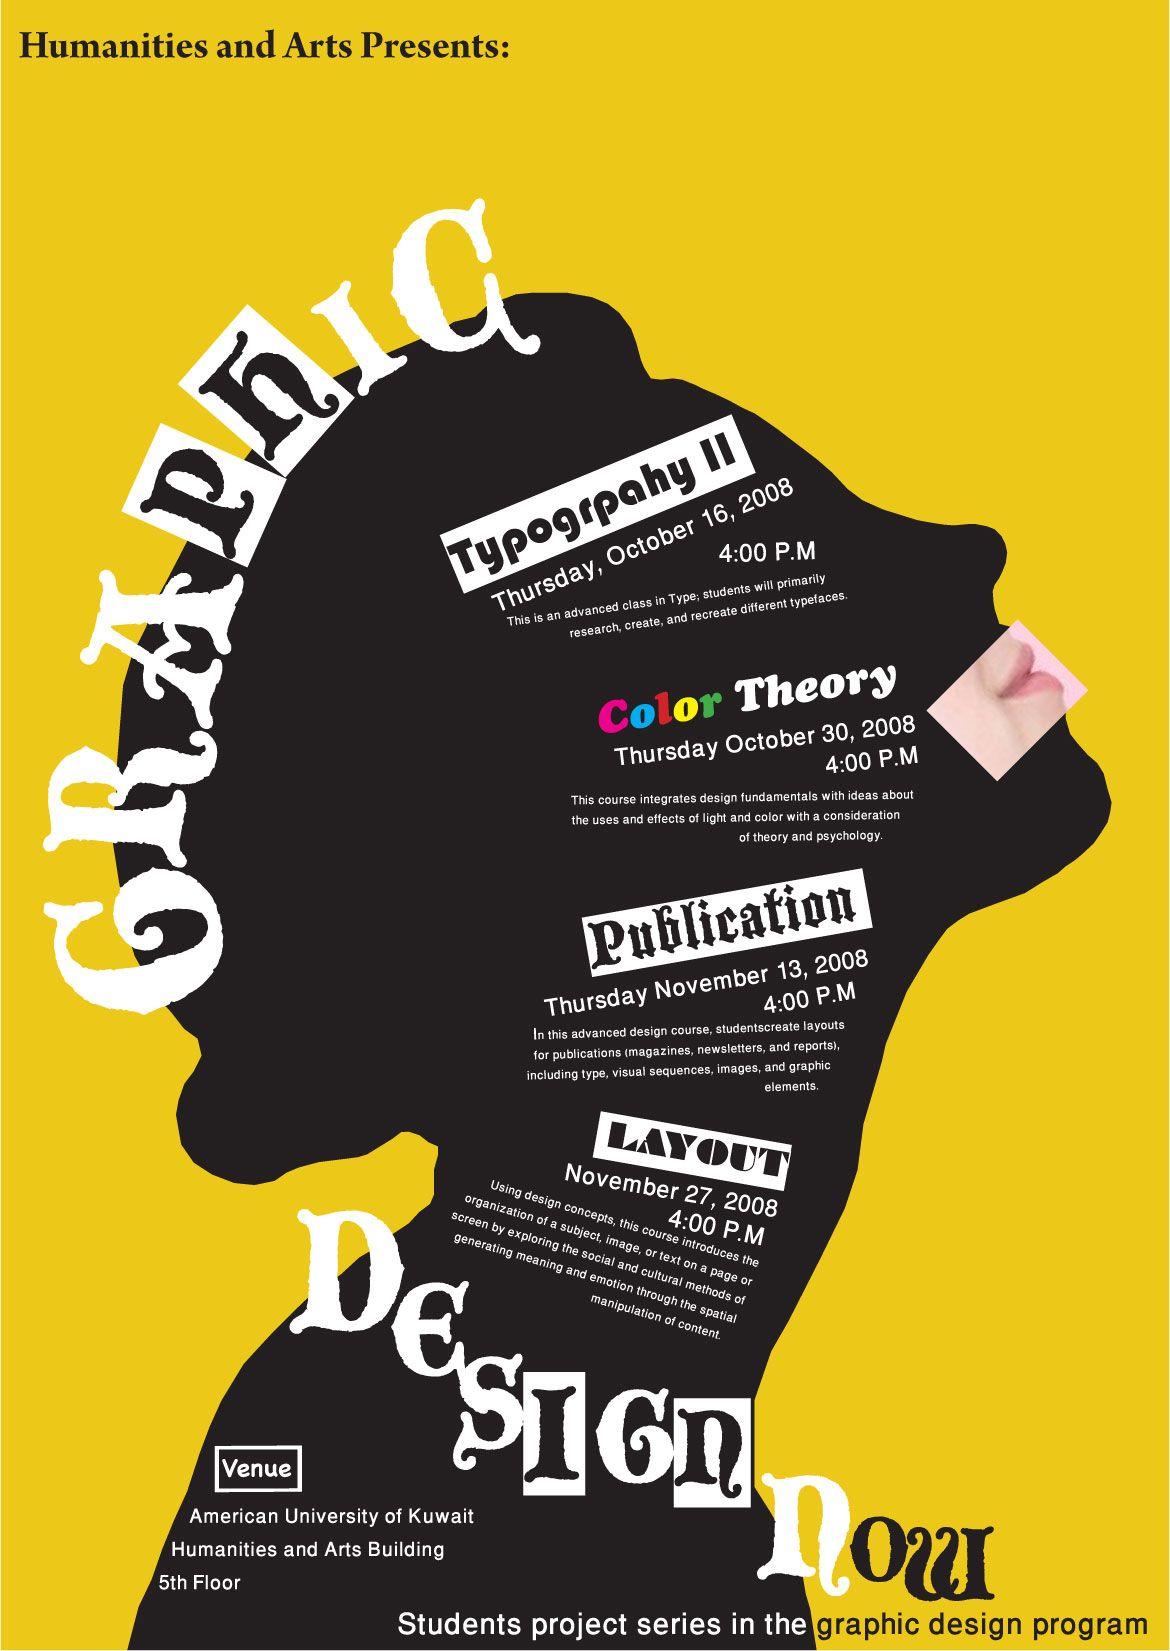 final poster project poster pinterest design graphic design